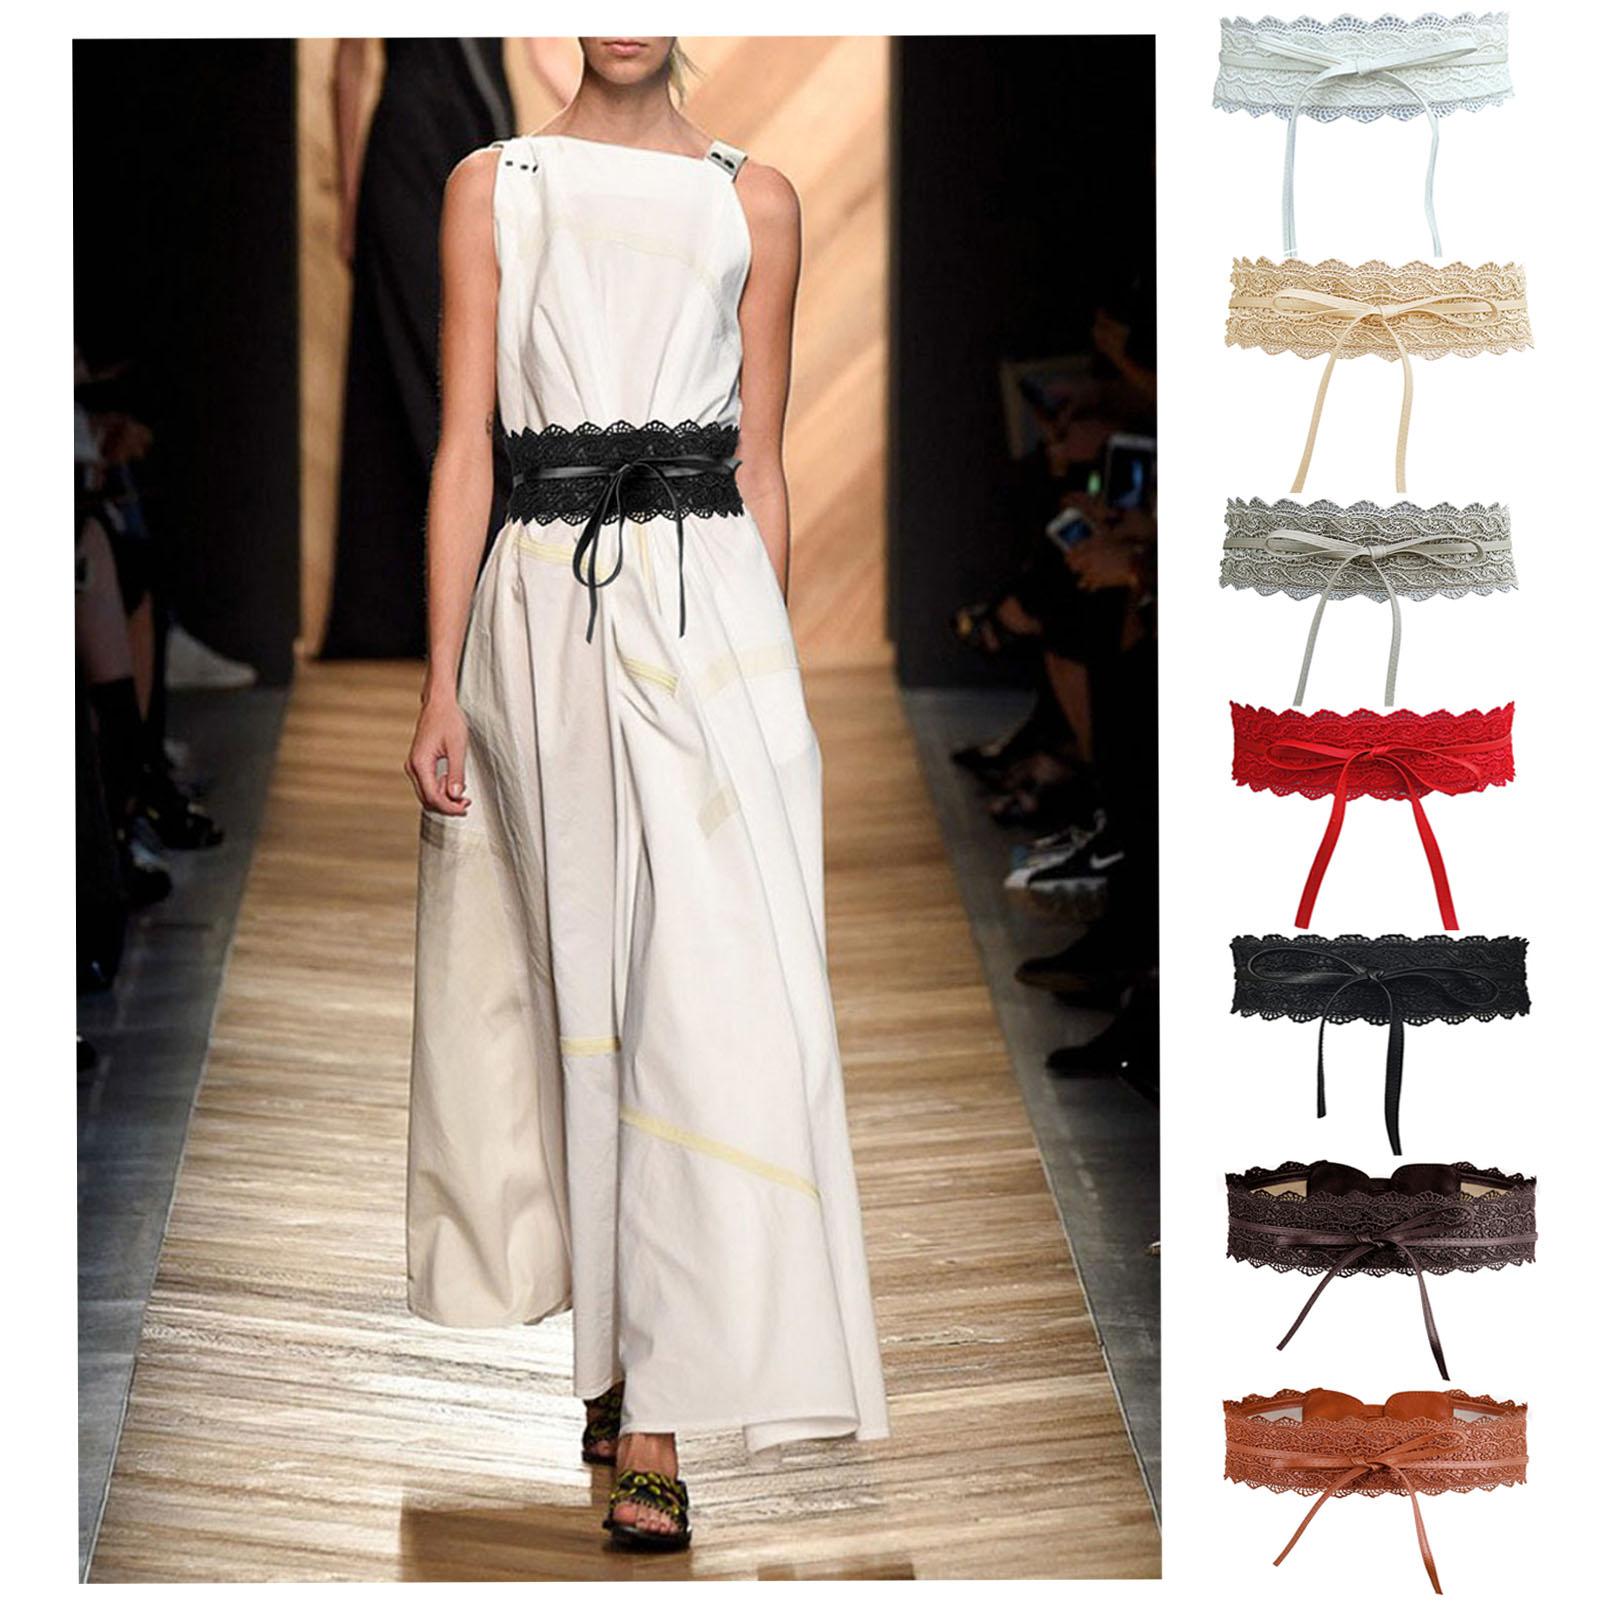 Womens Lace Waist Belt Soft Faux Leather Boho Band Corset Fashion Accessories For Dresses